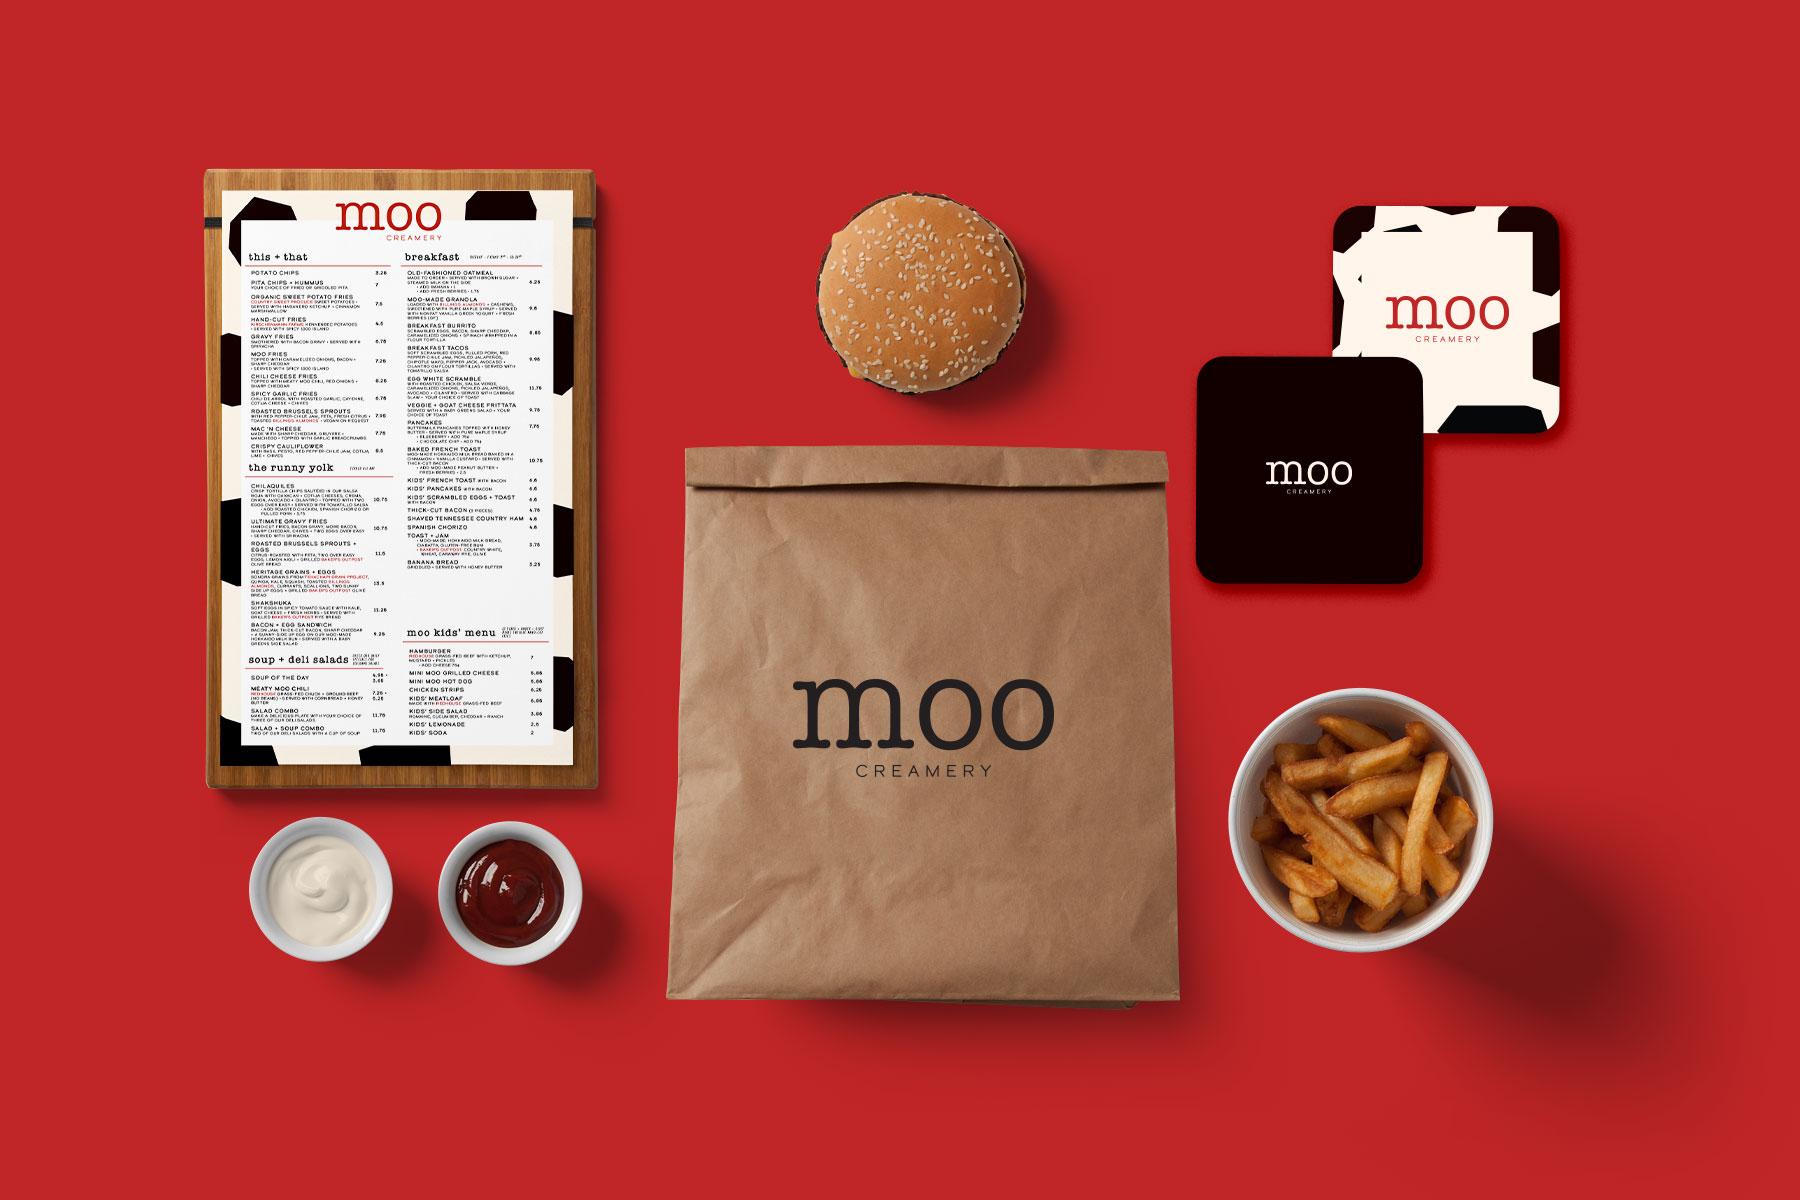 Moo-Creamery-Promotion_Asset-Mockup.jpg